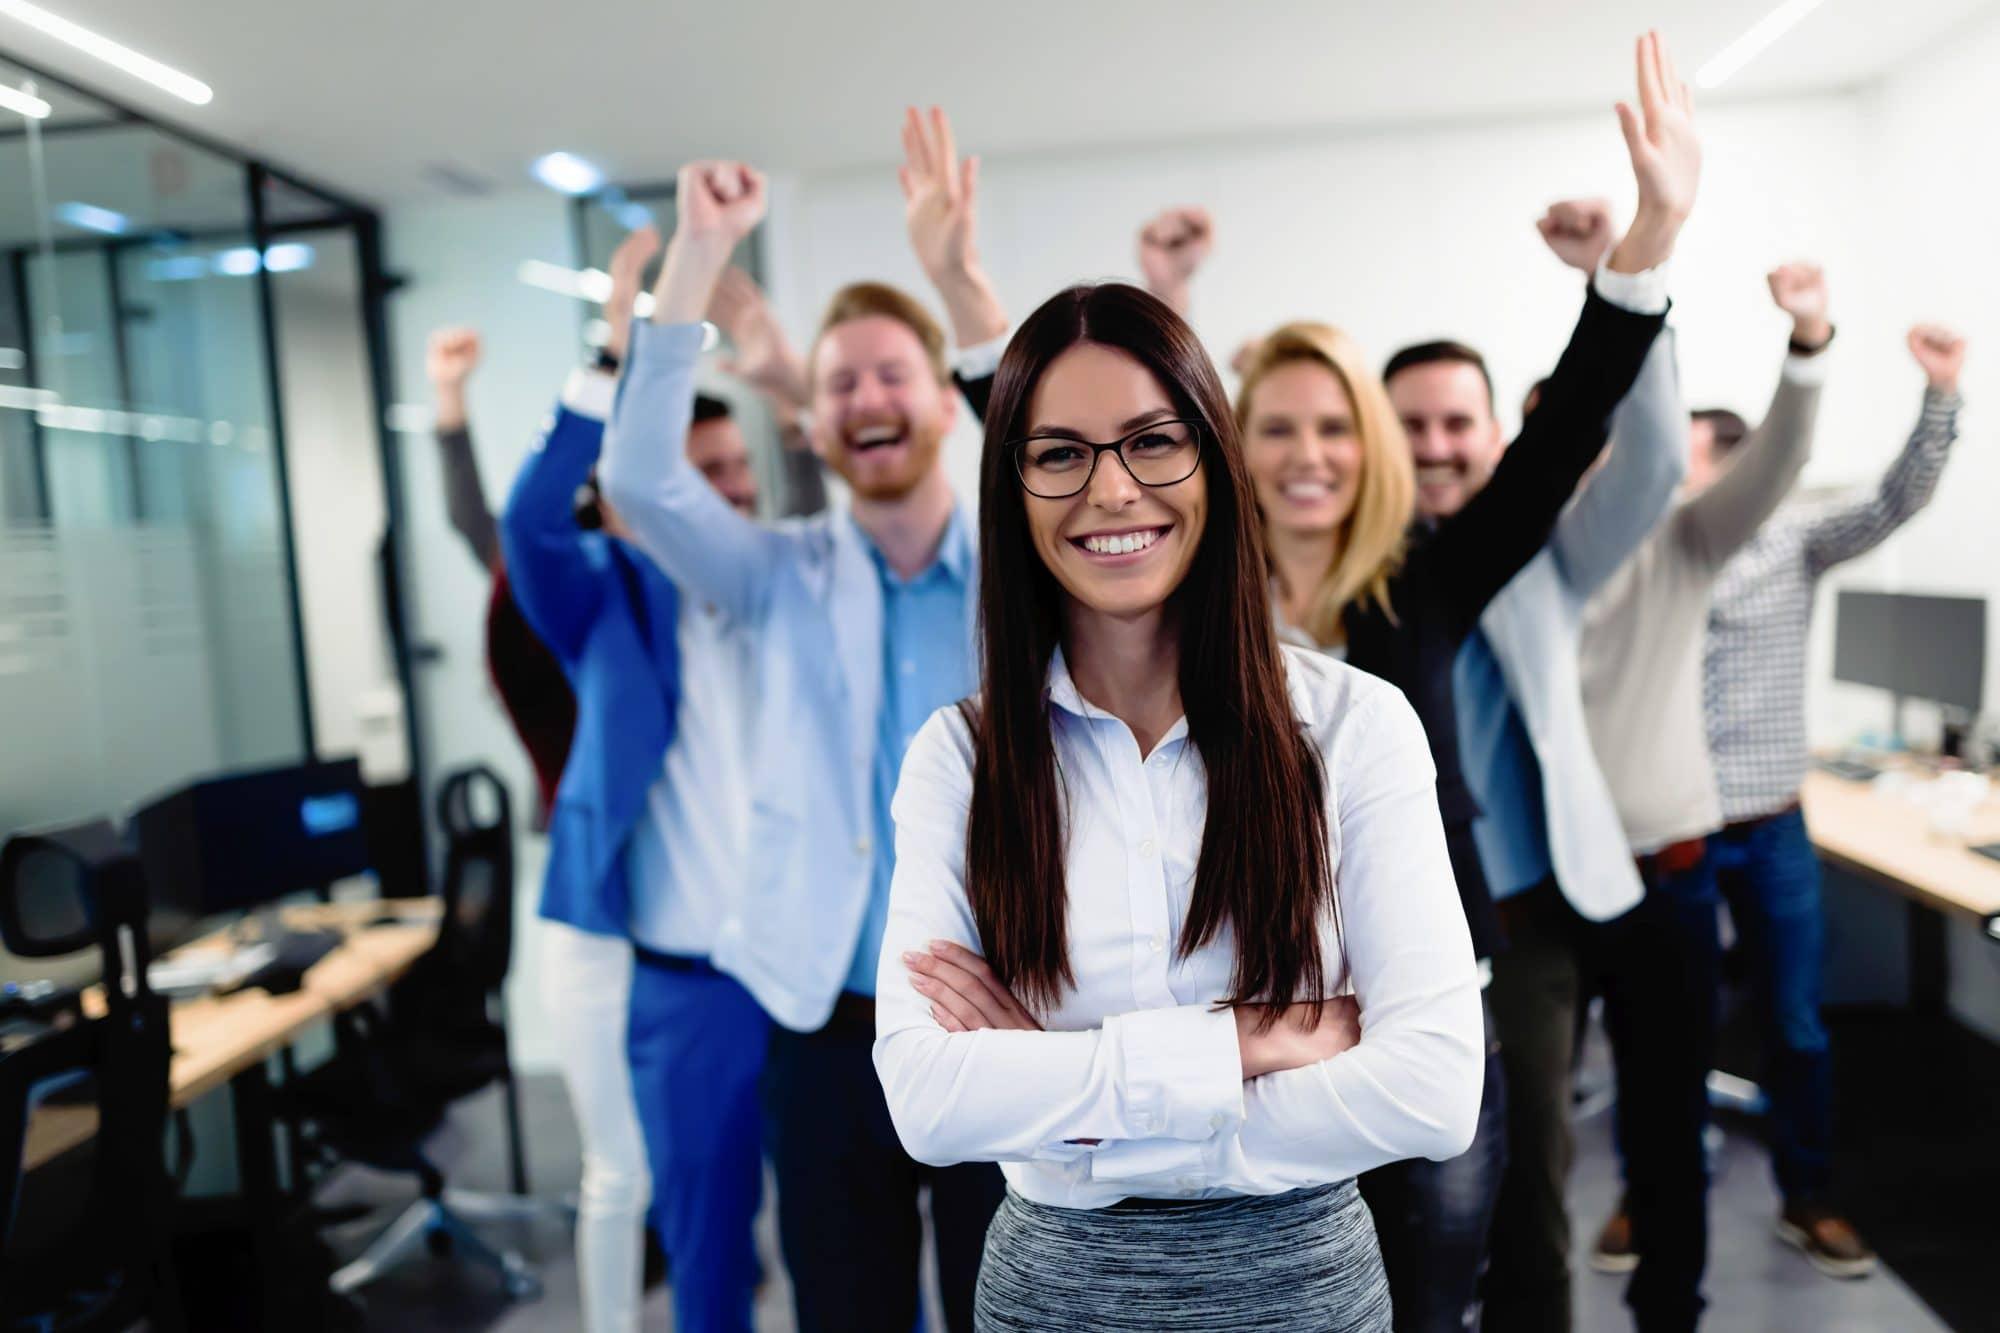 Project manager, una professione emergente